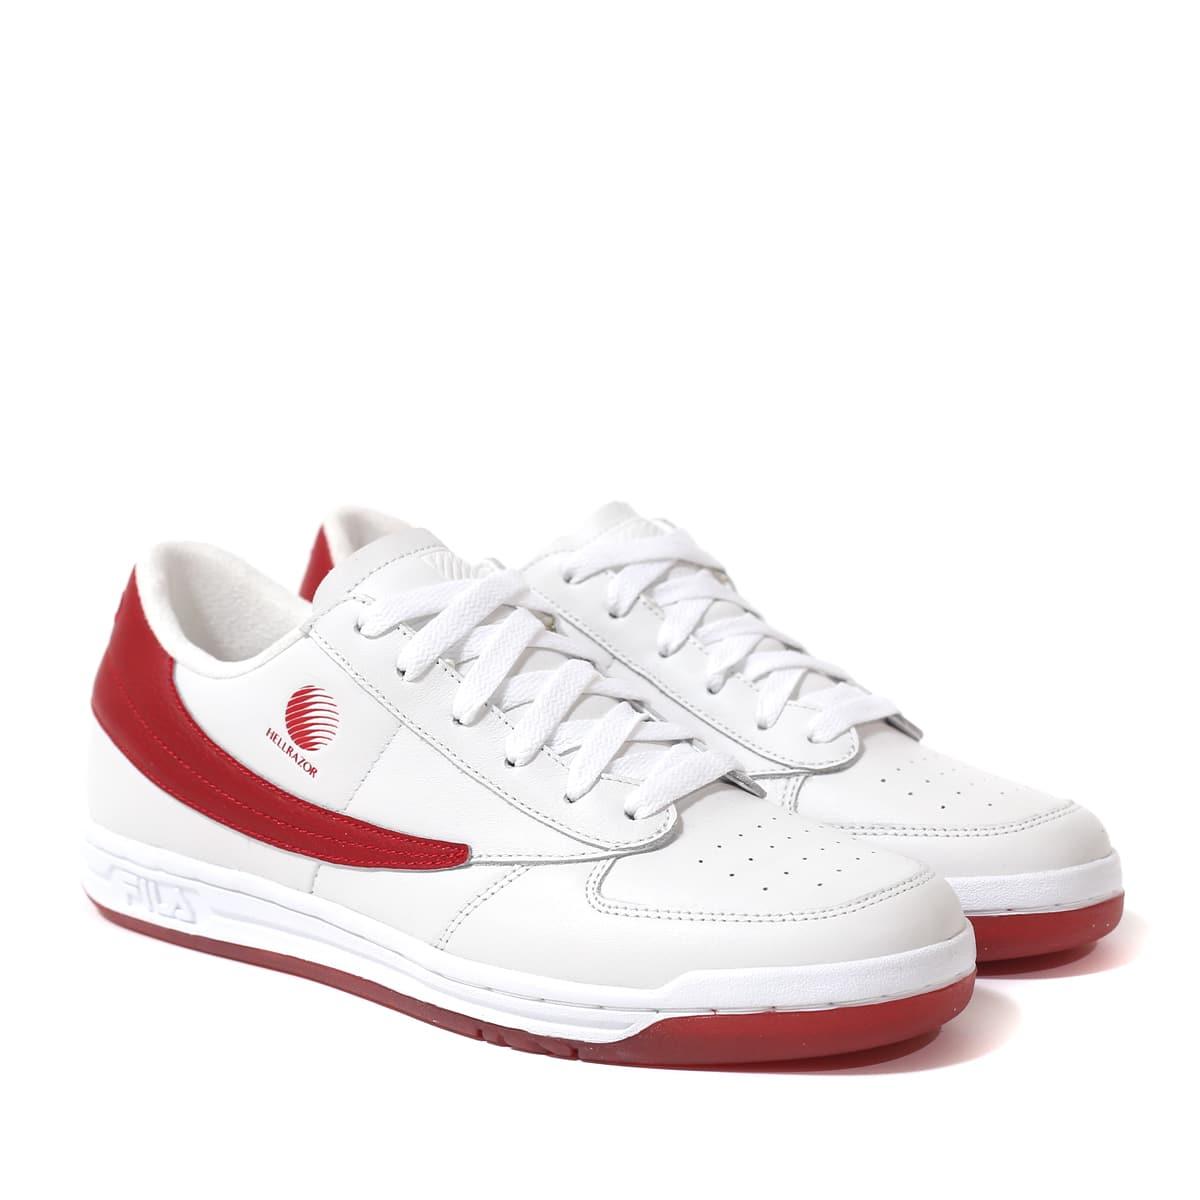 FILA Original Tennis X Hellrazor WHITE/RED 21SS-I_photo_large